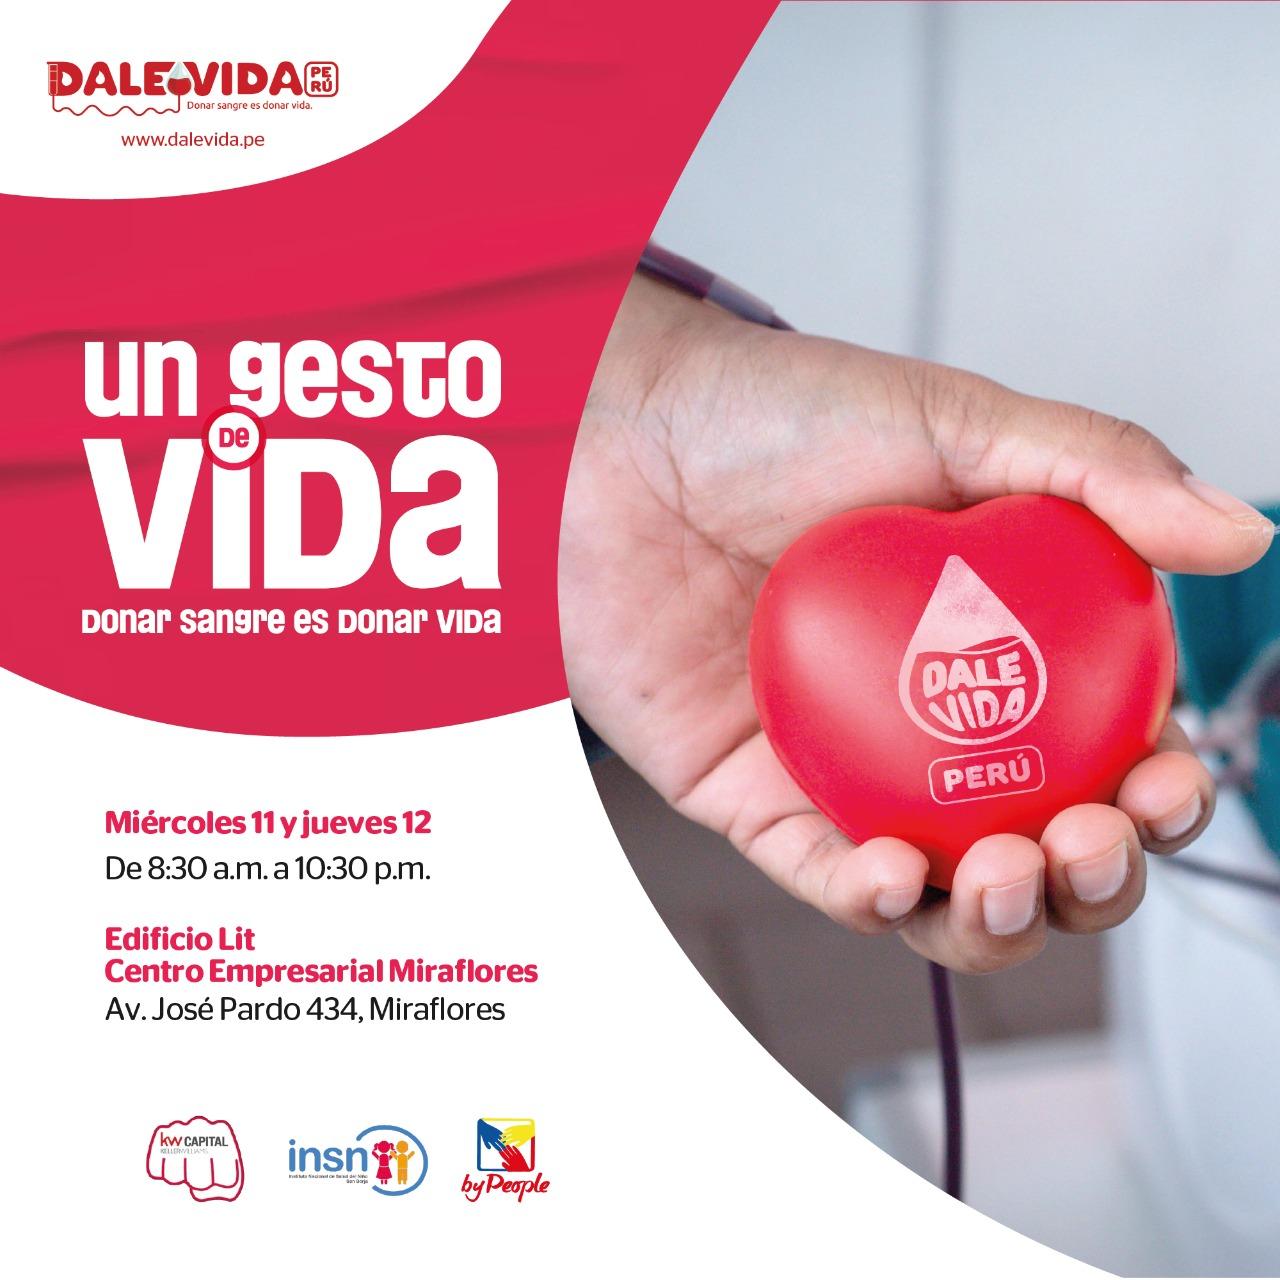 Dale Vida Kw Capital 2021: 20/08/2021